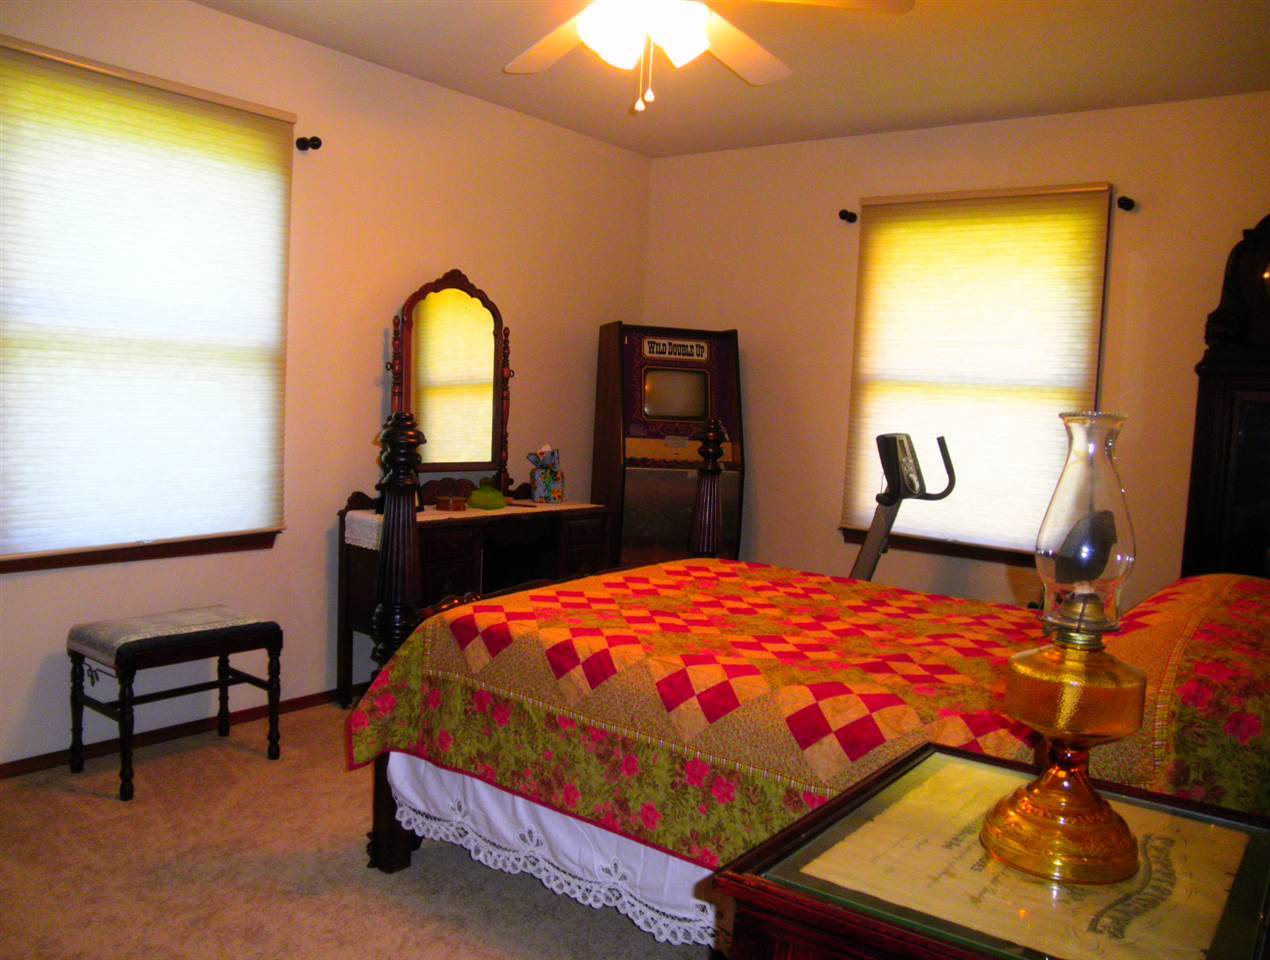 Sold Cross Sale W/ MLS | 32 Raintree Ponca City, OK 74604 14